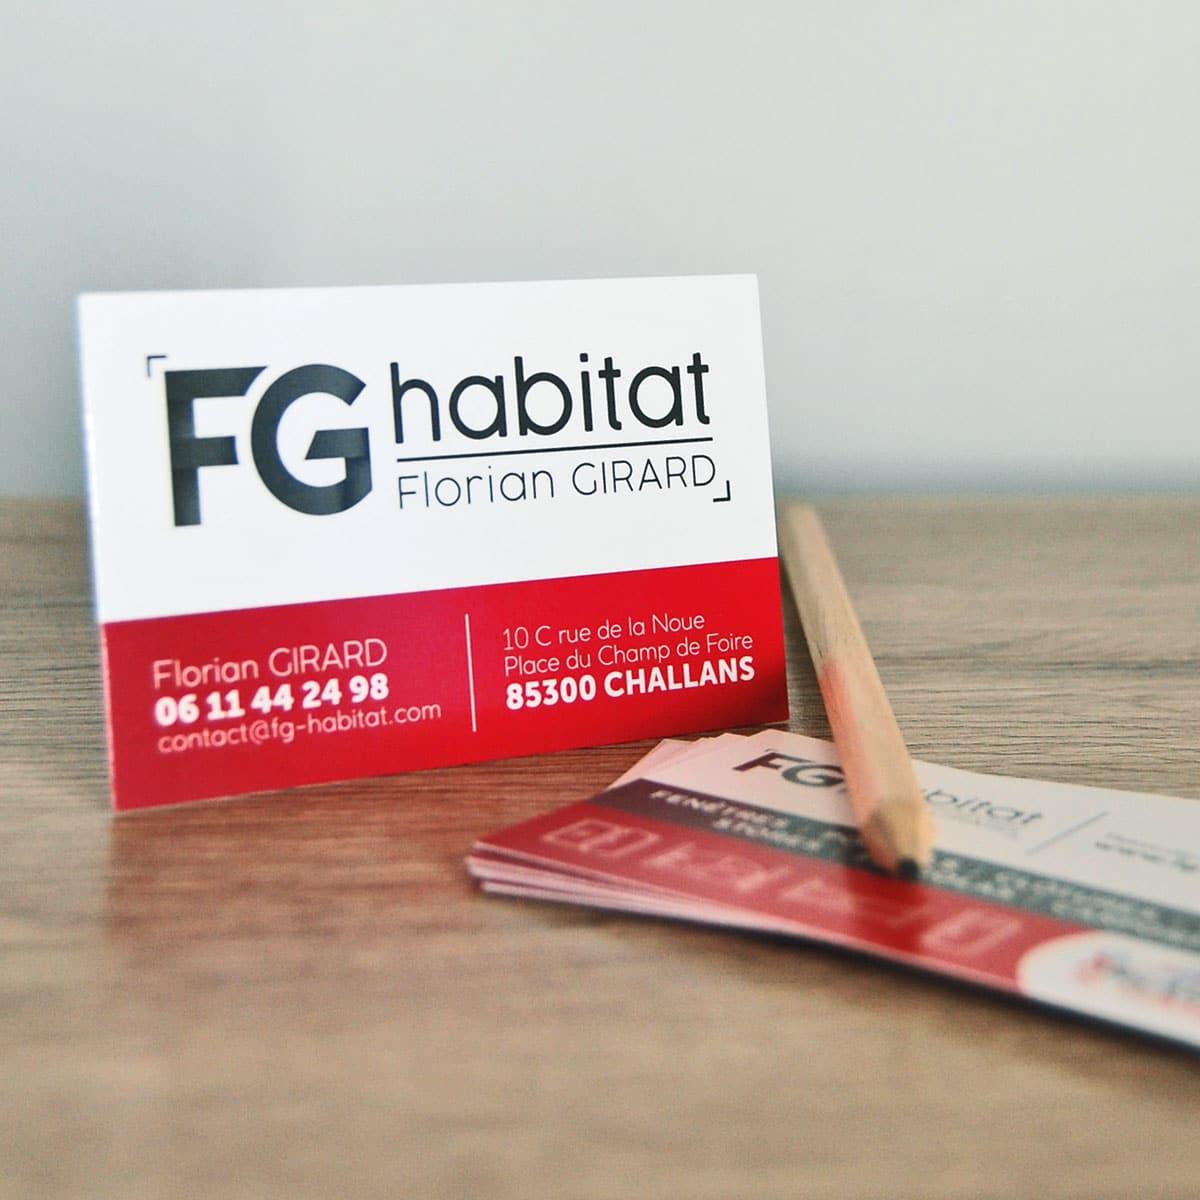 fg-habitat-carte2